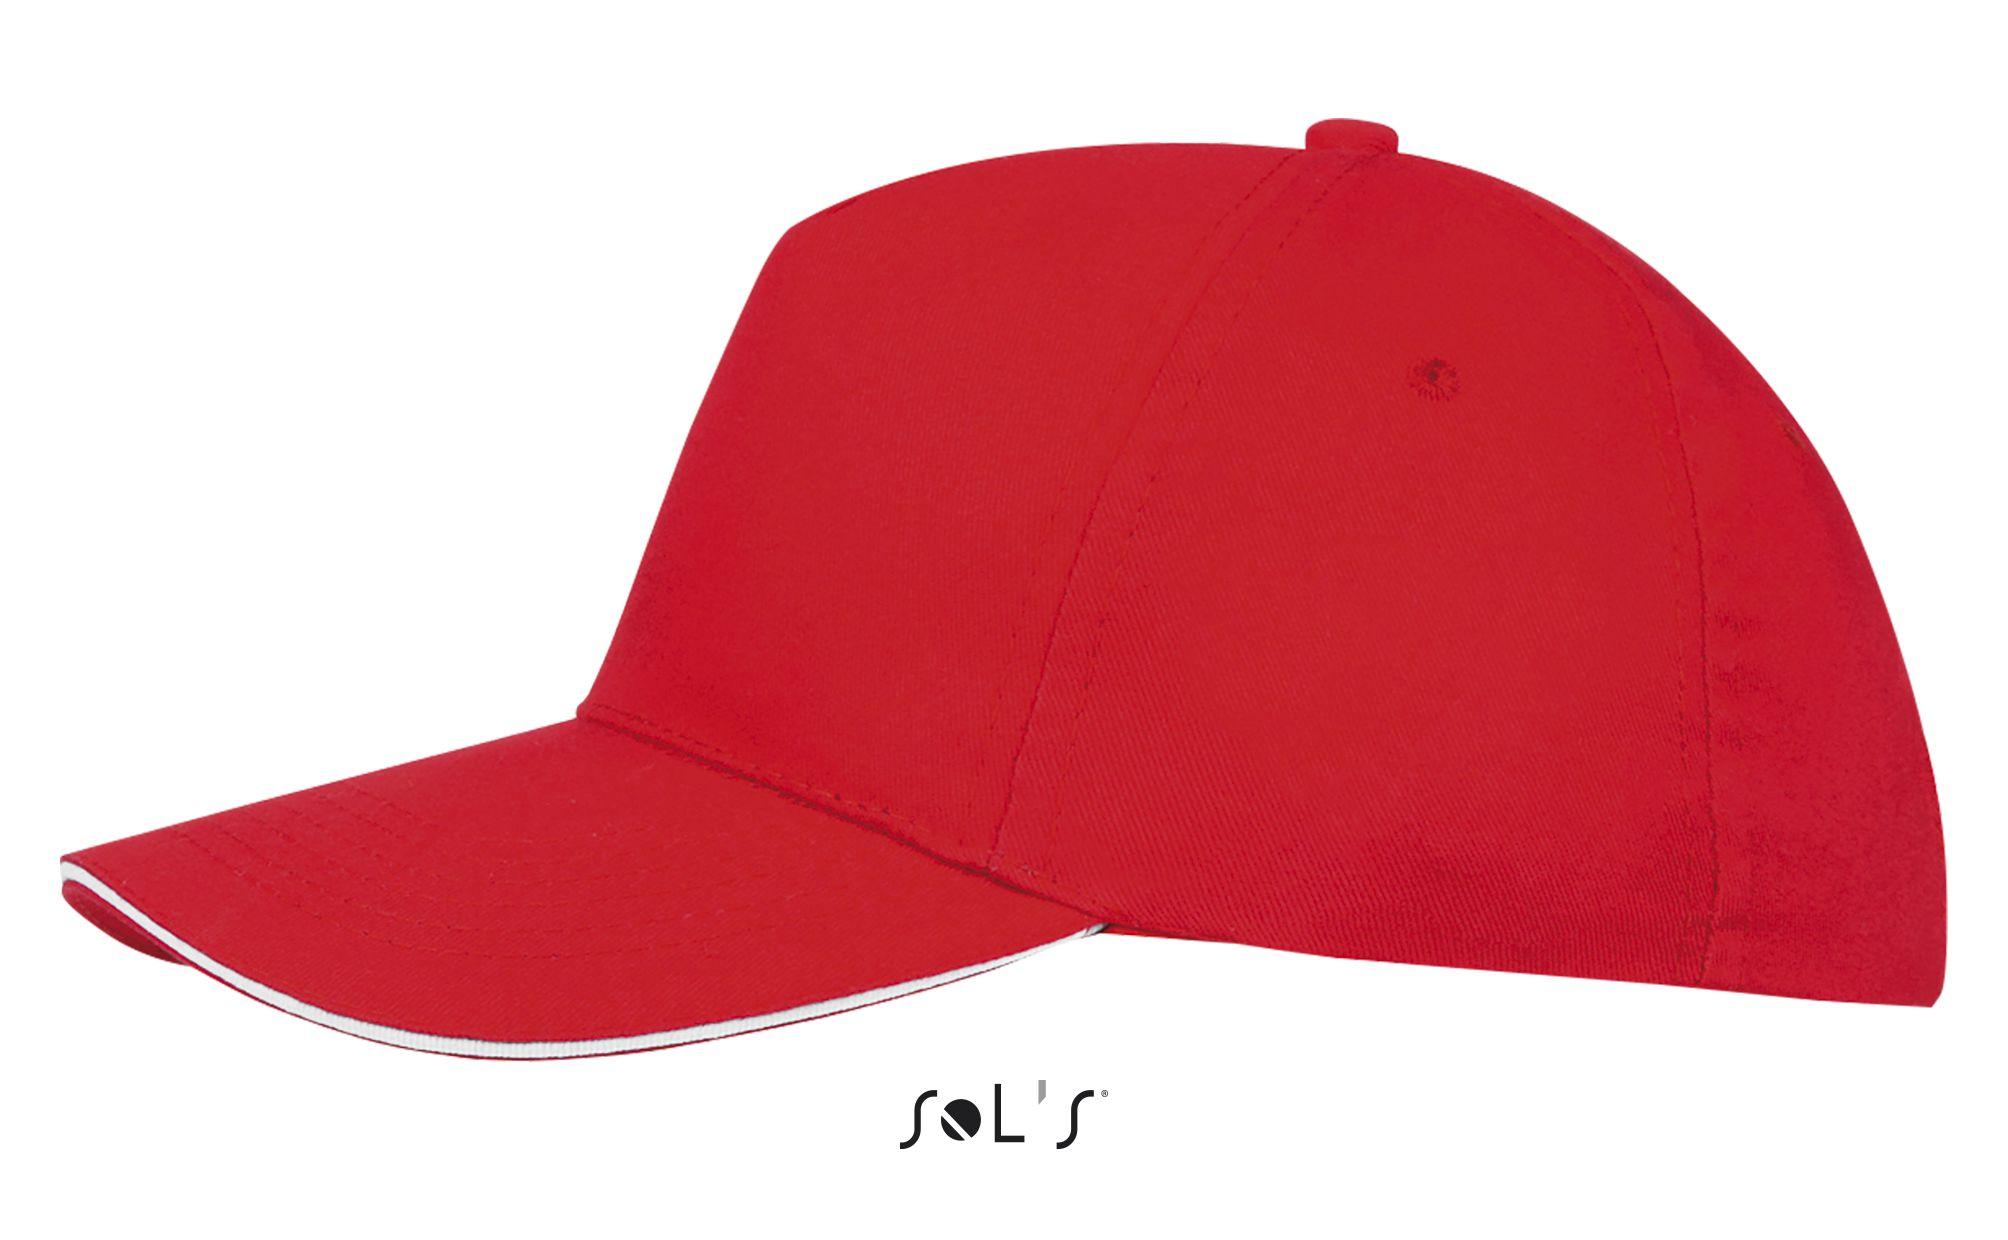 908 - Rouge / Blanc